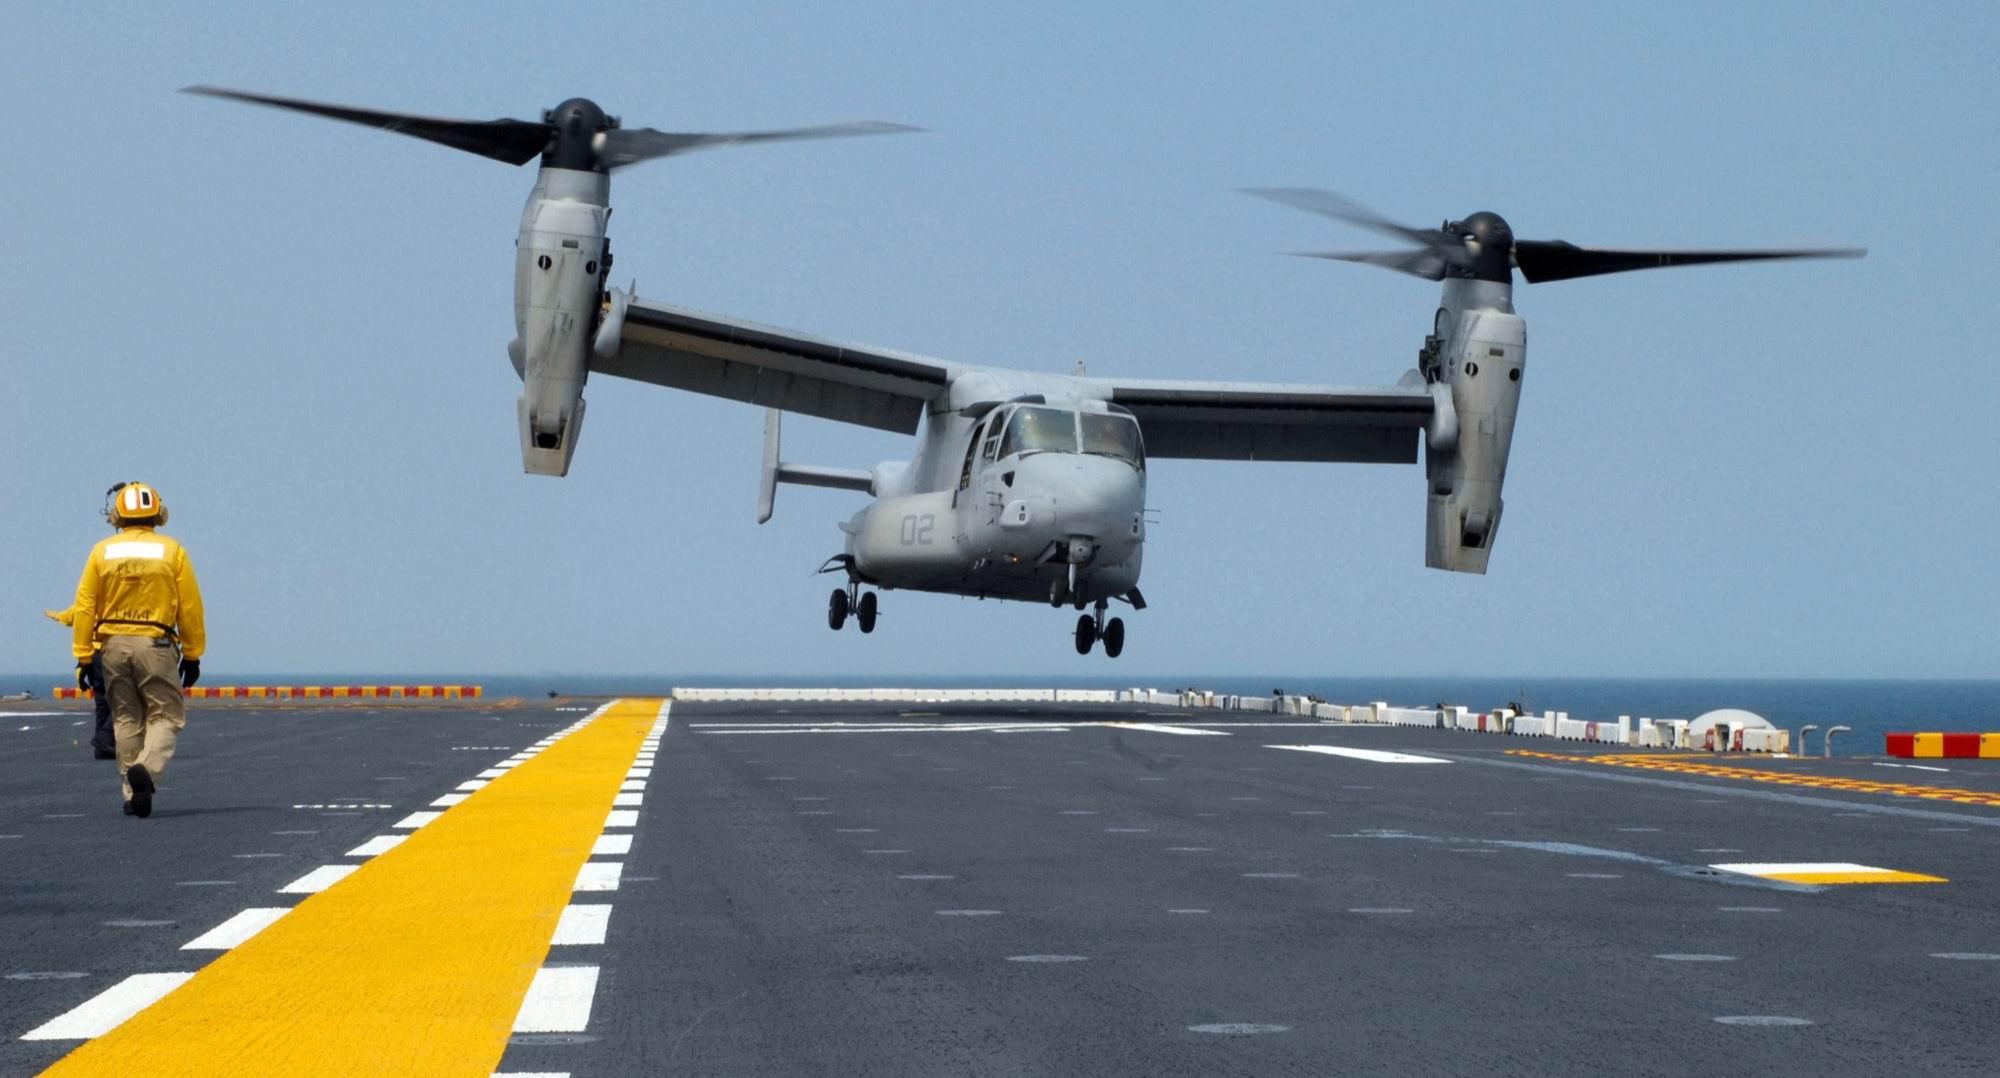 Elicottero 007 : Giappone: usa dispiegano aerei ad okinawa malgrado forte opposizione